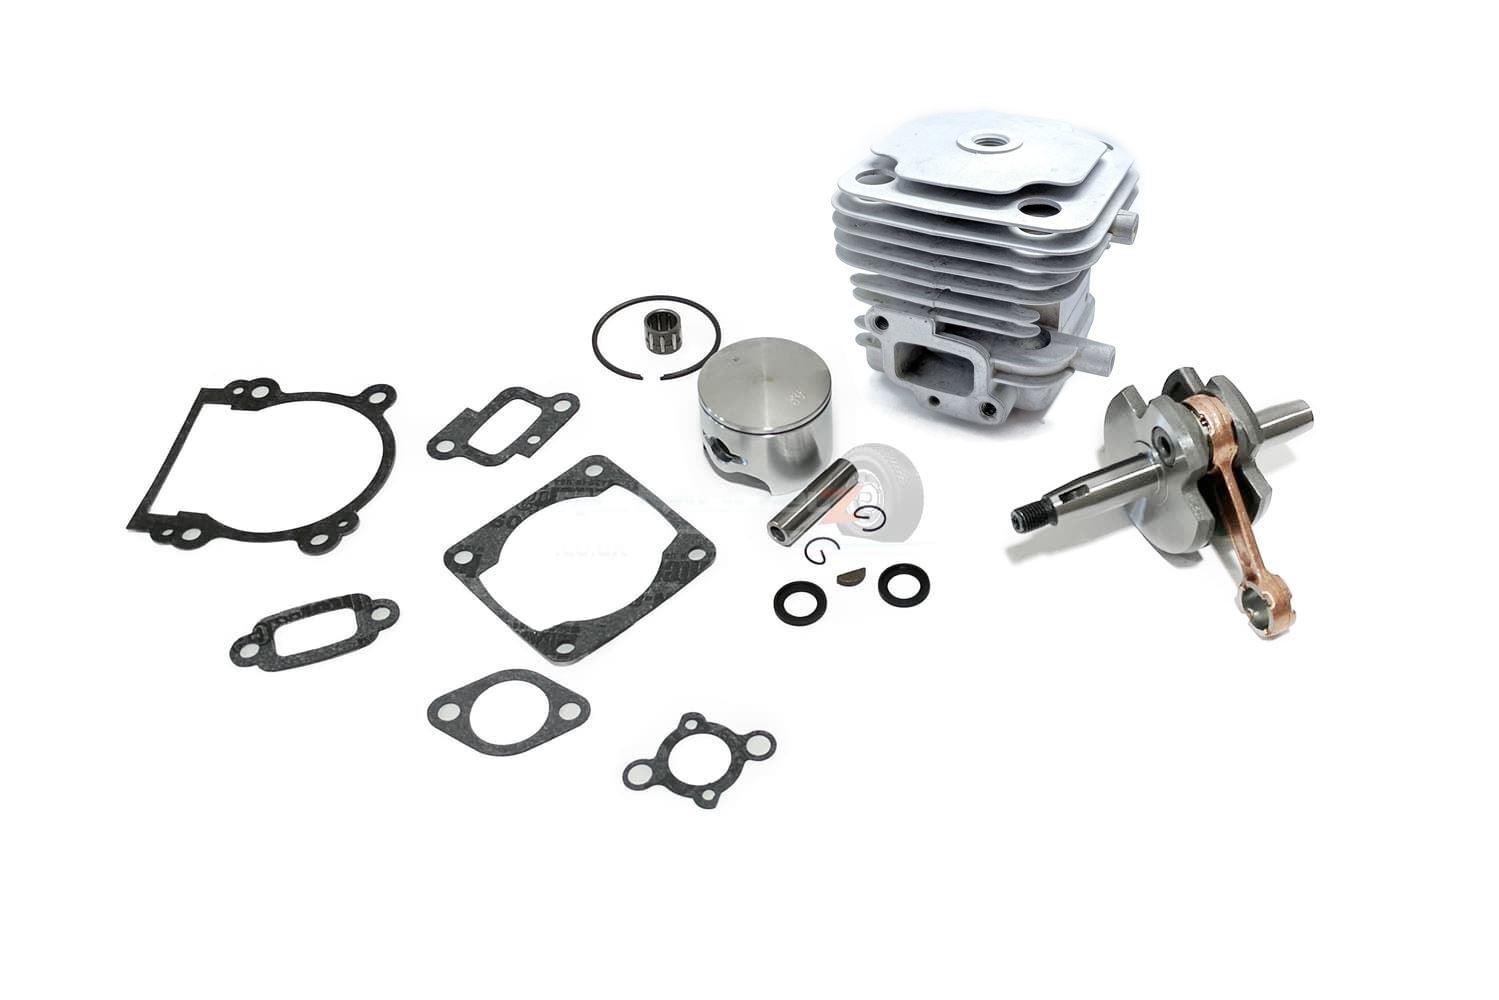 Rovan 4-Bolt Engine Kit 32cc to 36cc For Rovan 32cc,Rovan 36cc,Zenoah G320,